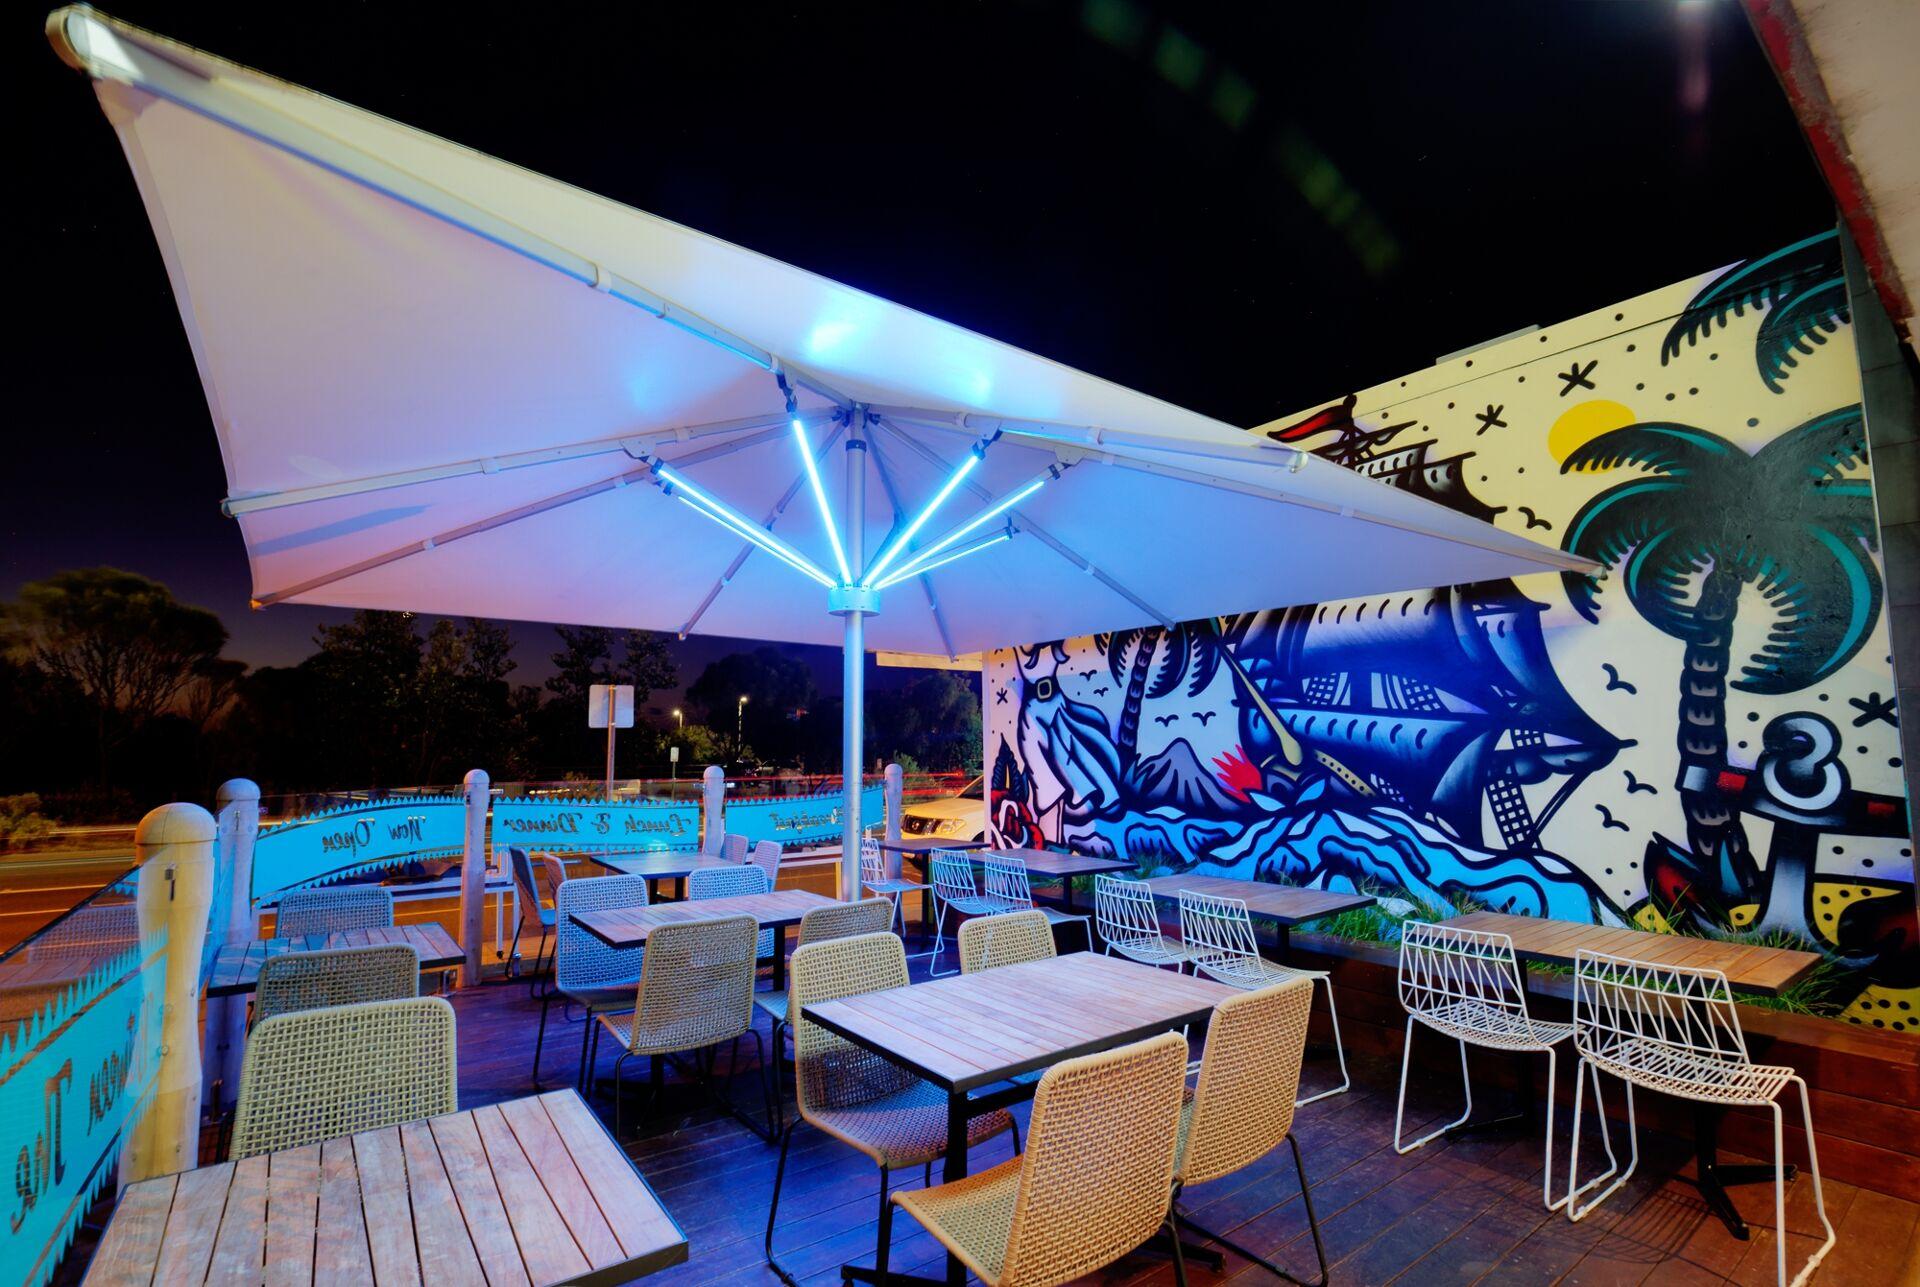 Tempest LED Outdoor Lighting Umbrella